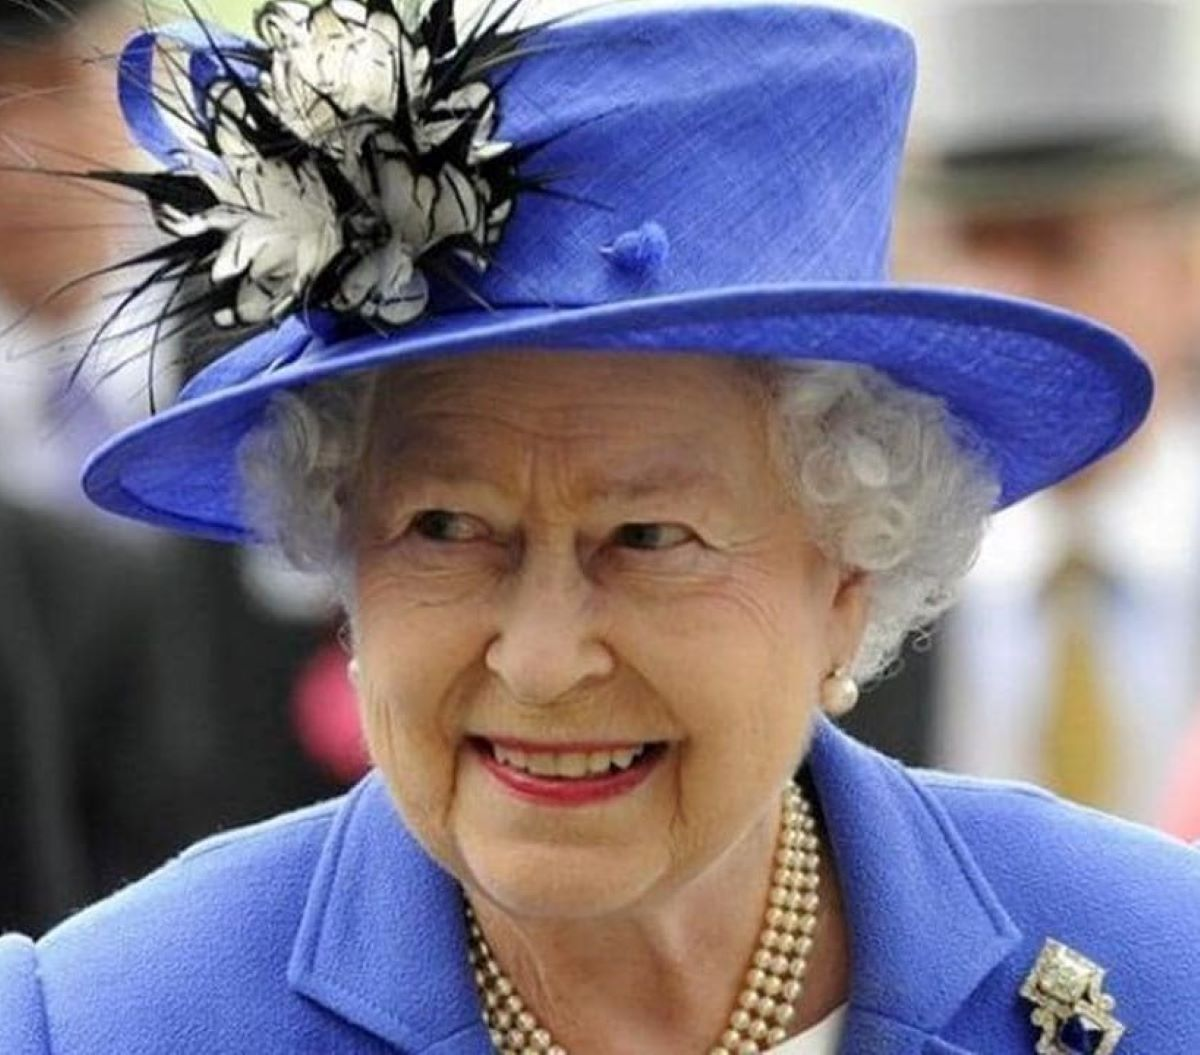 Harry Meghan Markle Battesimo Lilibet Diana Windsor Regina Elisabetta